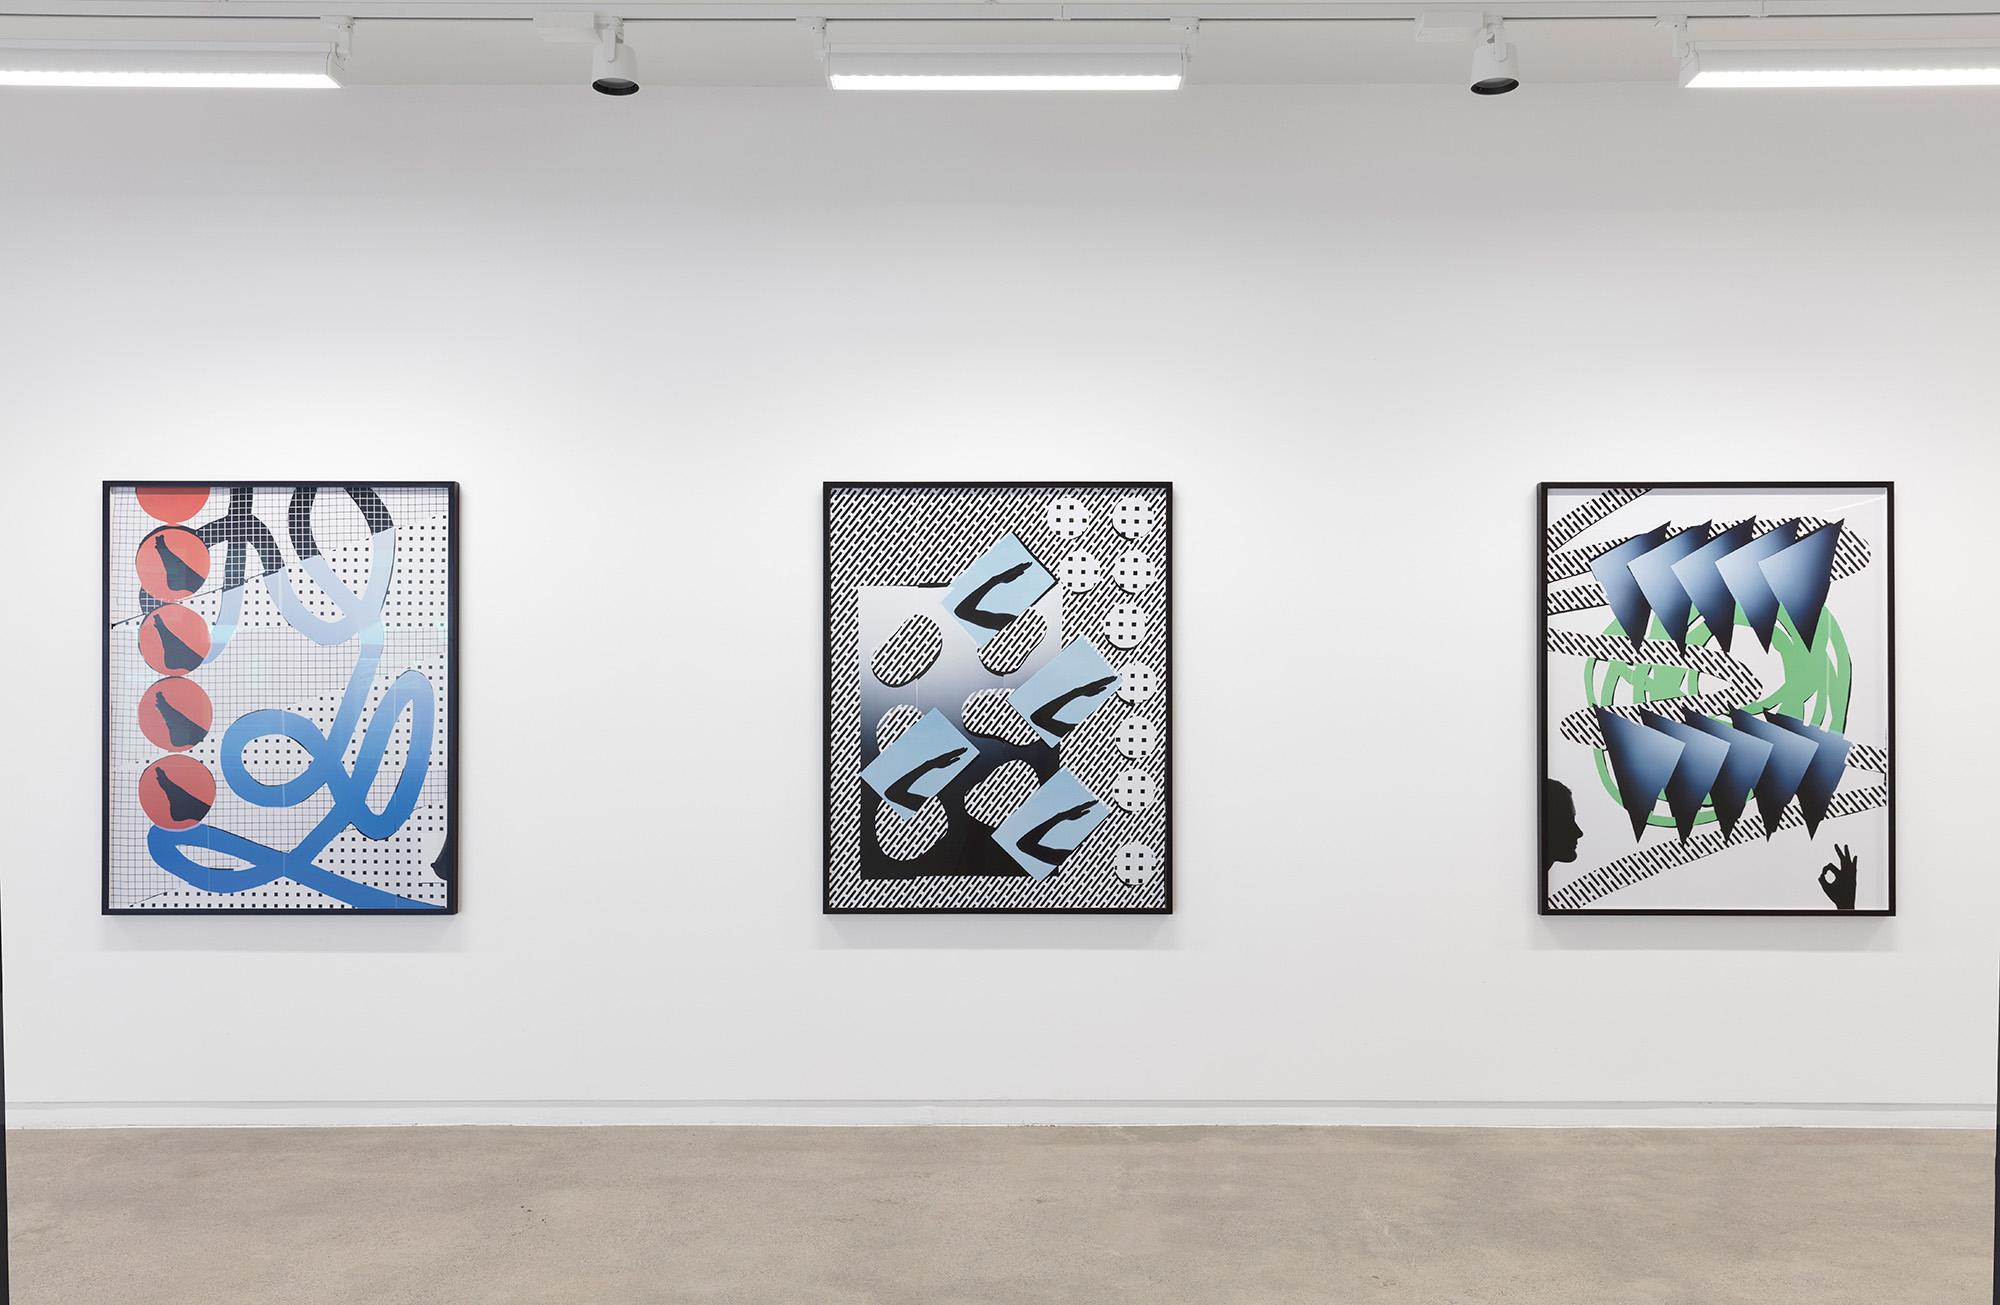 Hannah Whitaker at Golsa, curated by MELK 2018